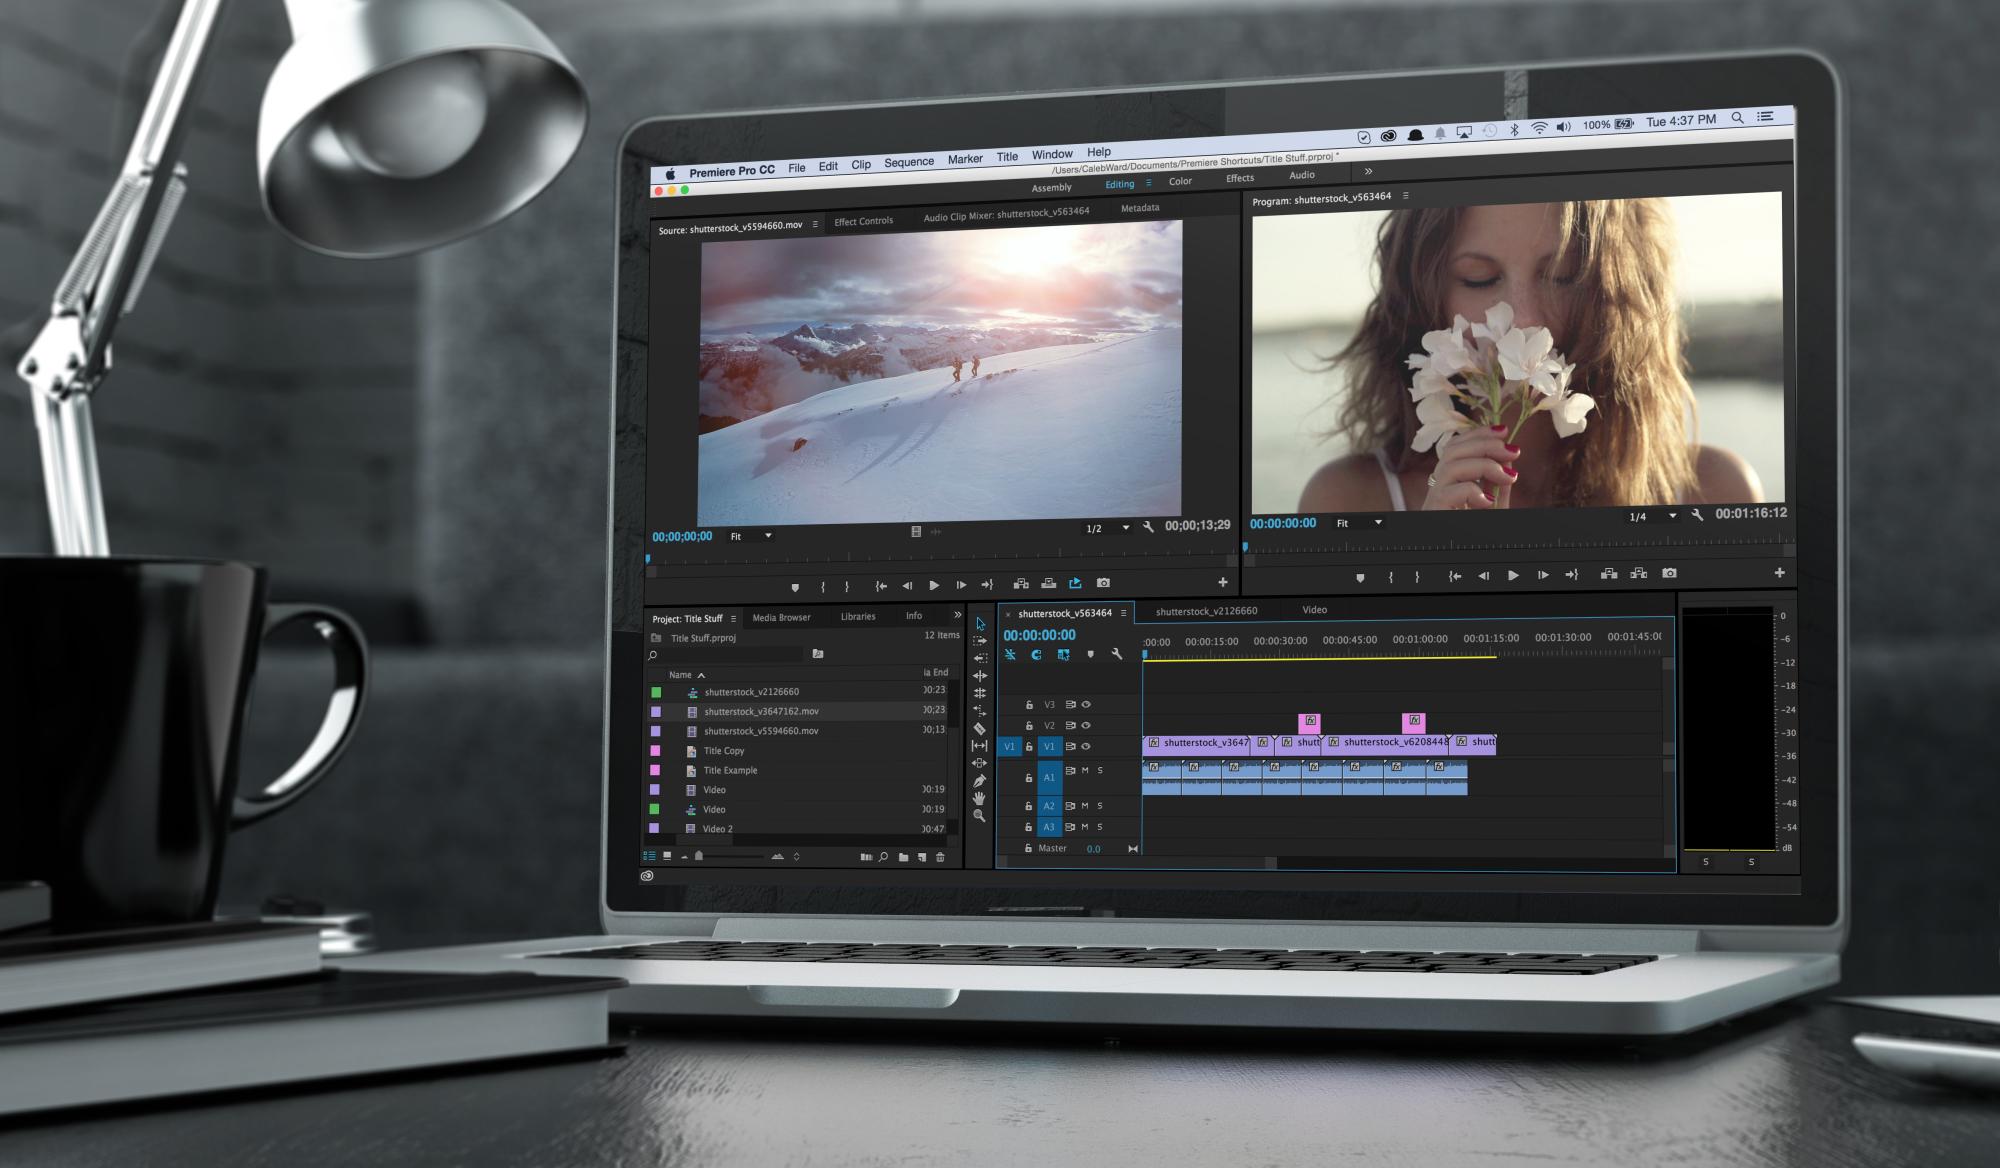 Mejores Portátiles para Edición de vídeo